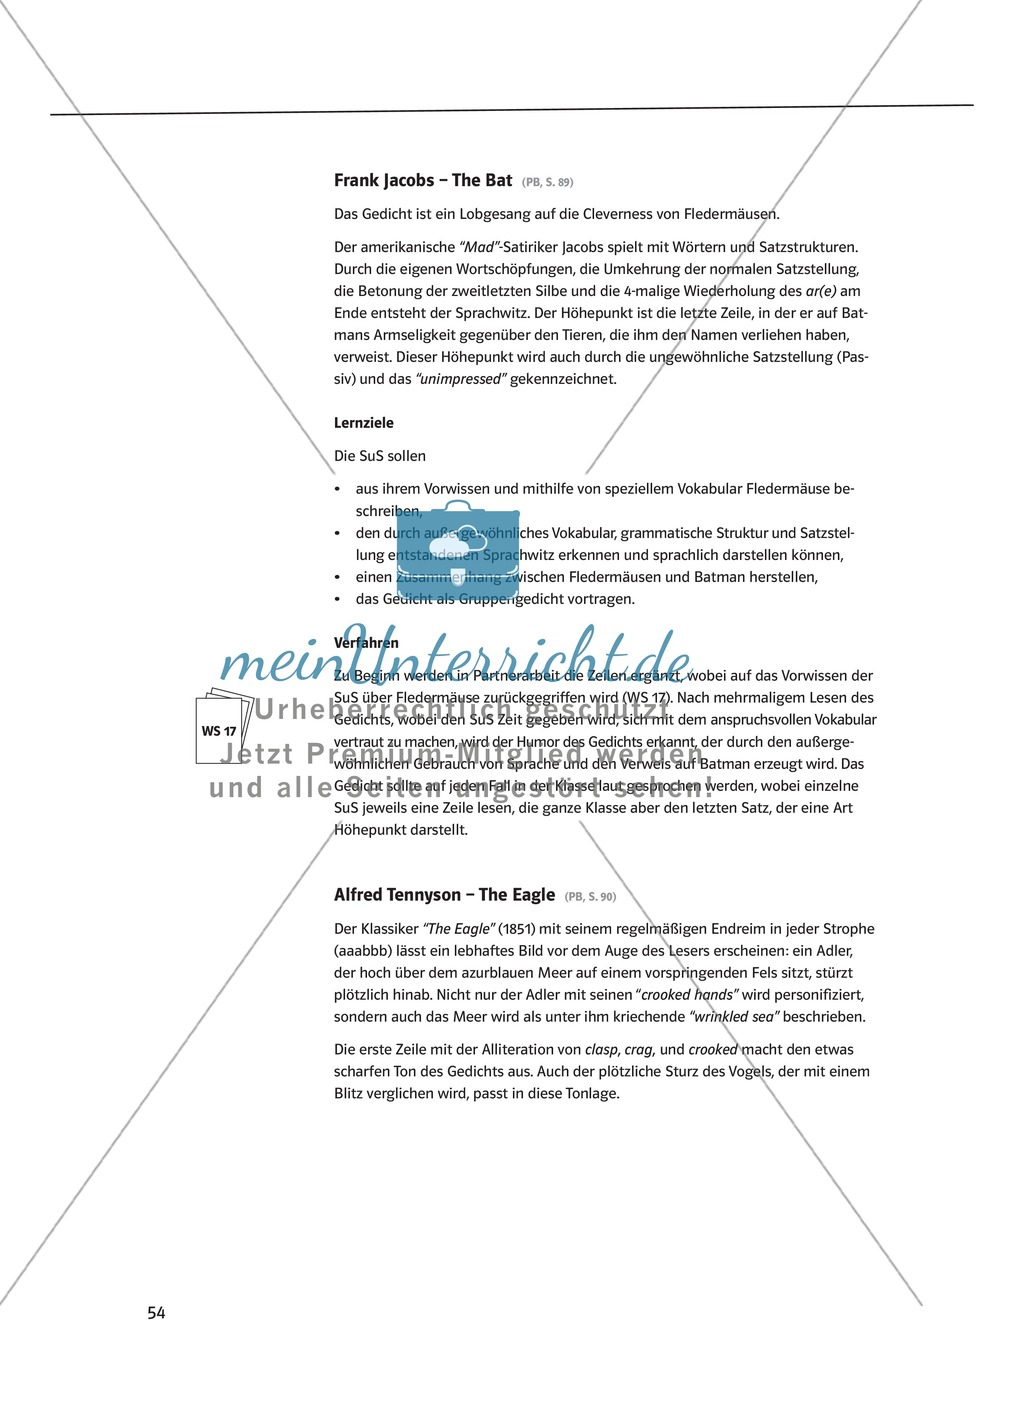 The Poetry Box: Wild Things? Beispiele + Lernziele + Verfahren + Arbeitsblätter Preview 4